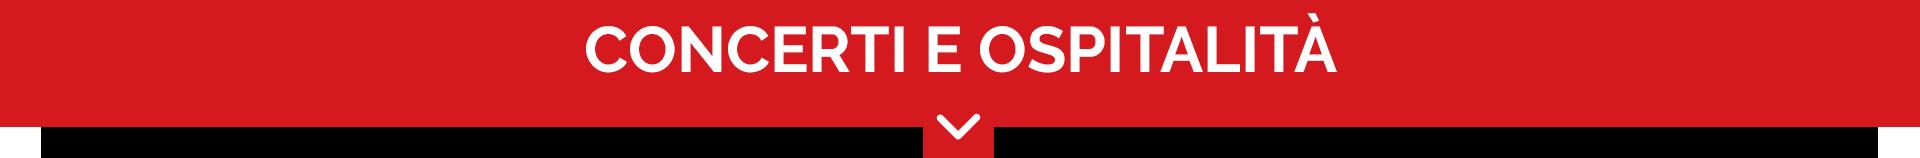 testata-Concerti-Ospitalita